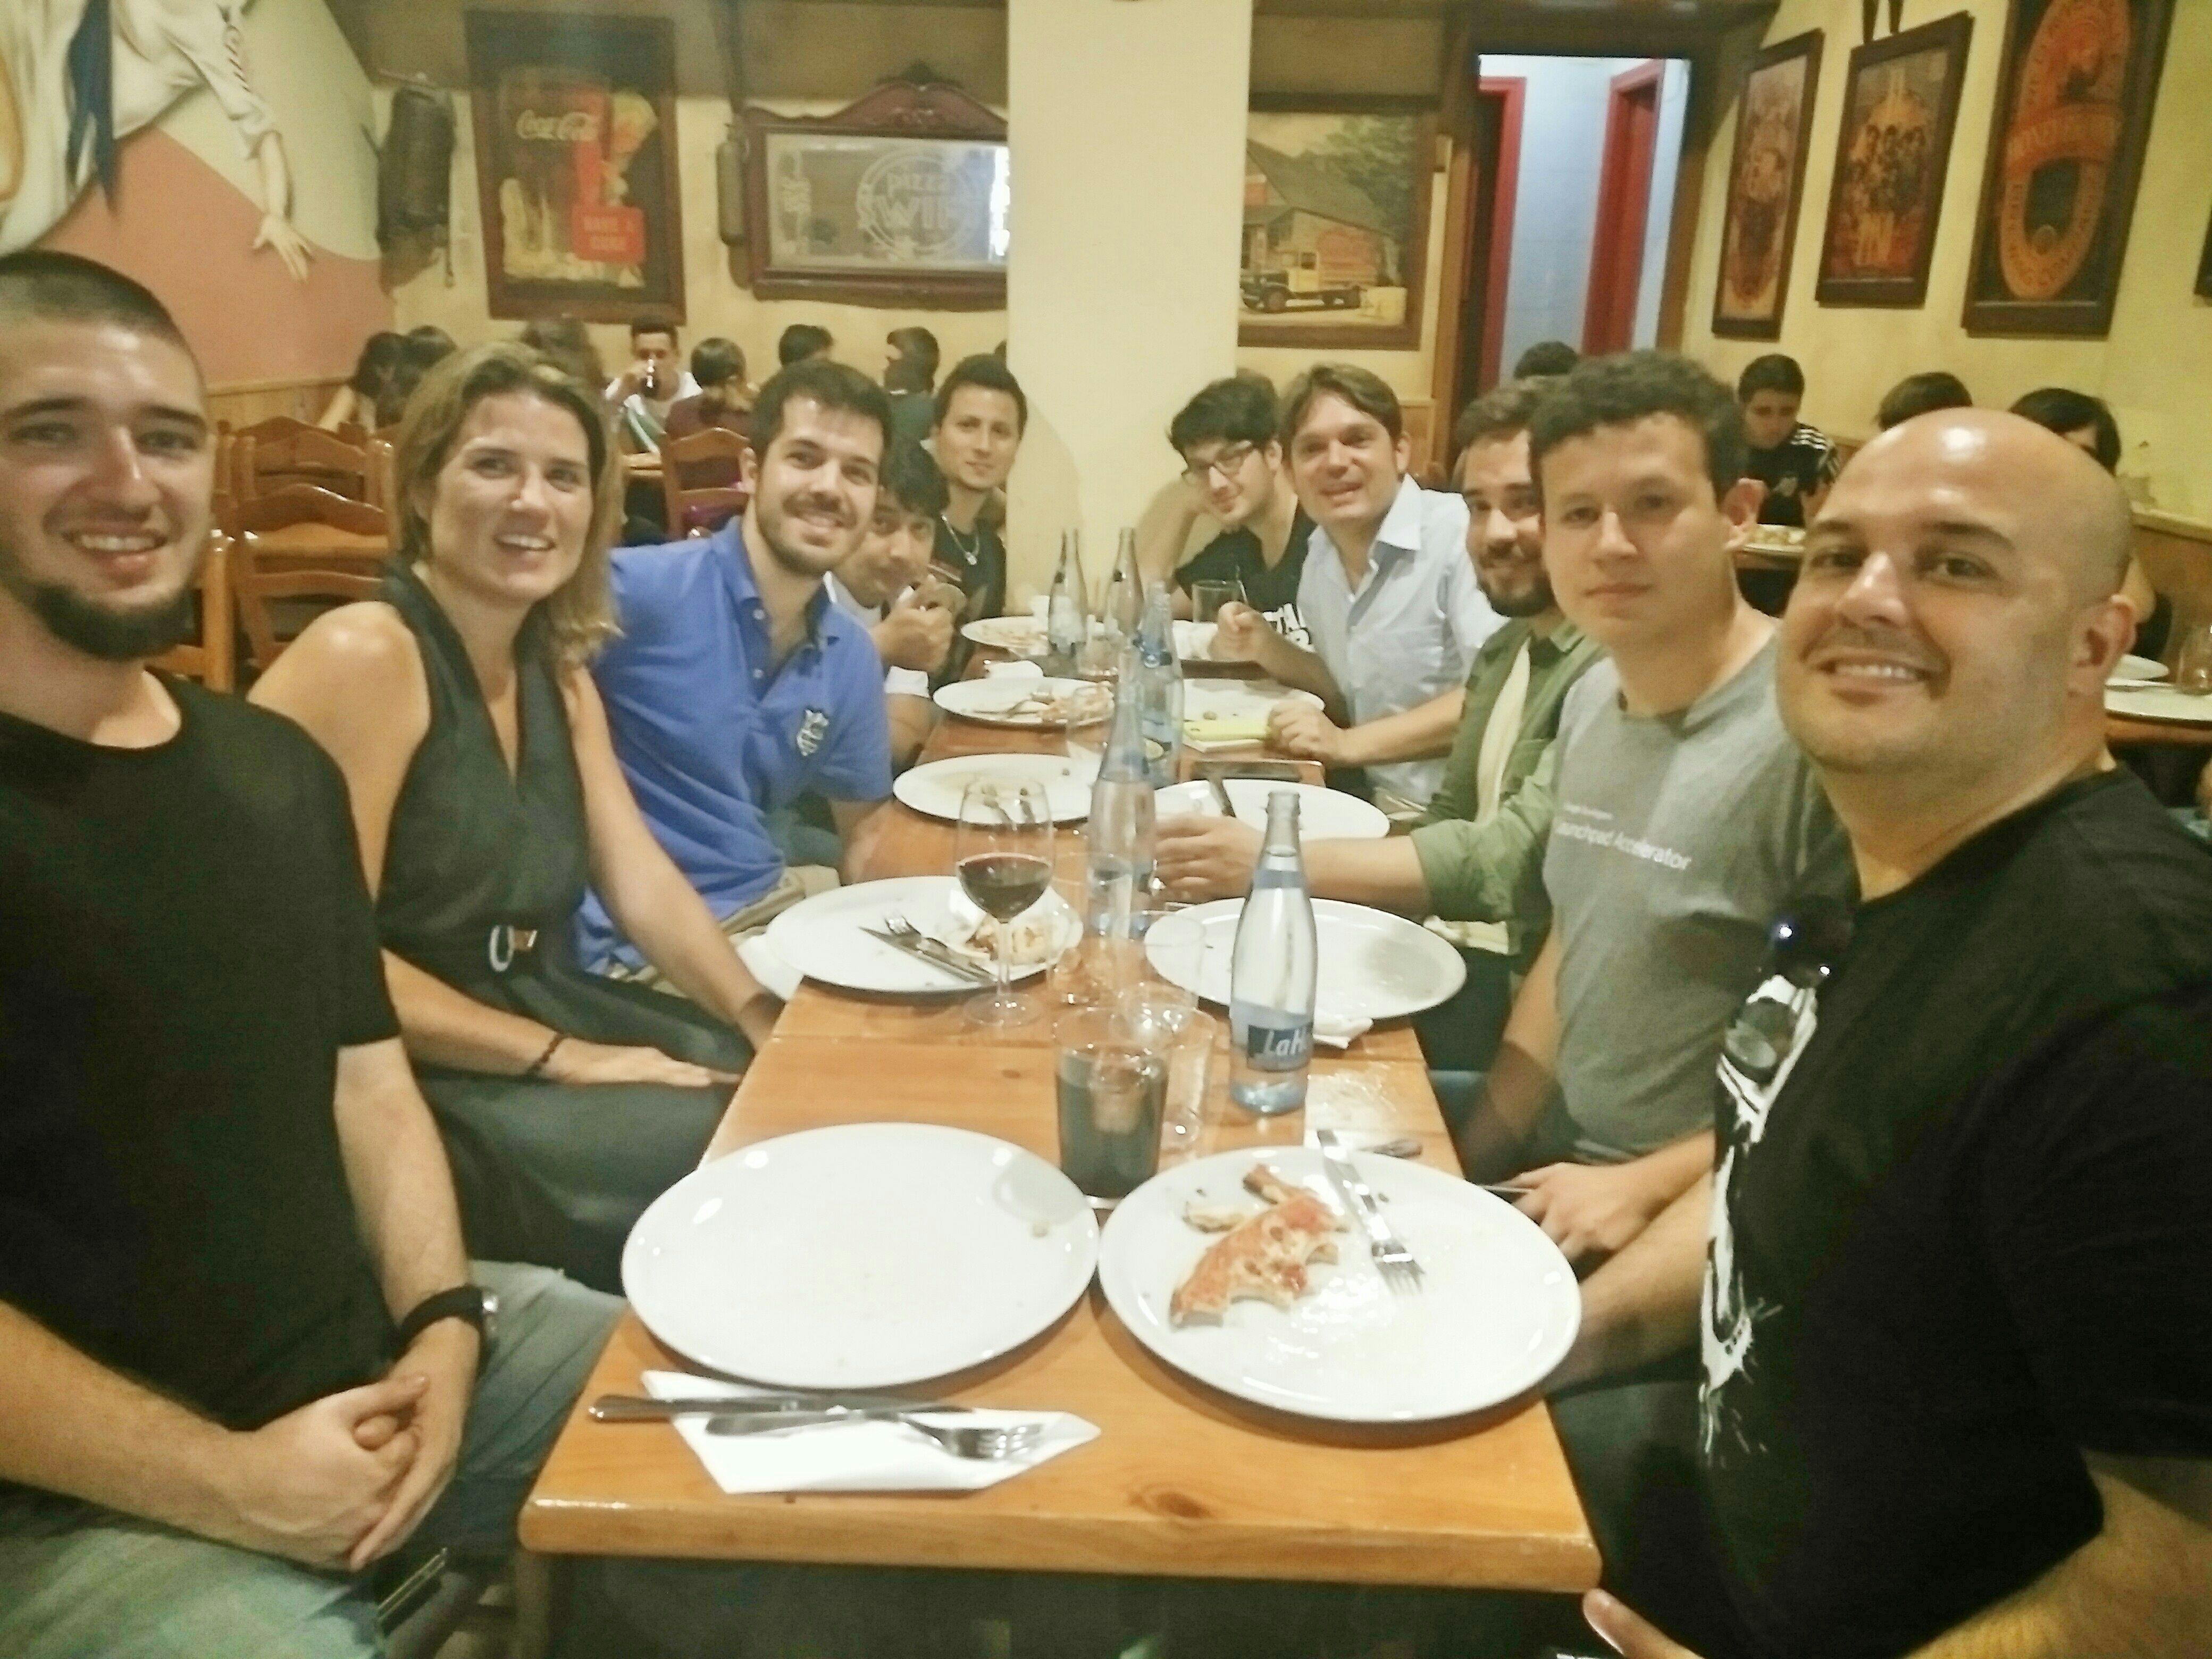 Meeting like-minded digital lovrs in VLC tonight 😀Cngrts 4 the event guys! Startup Vendetta Ferran Arricivita Juan Pablo Rojas Daniel Martínez